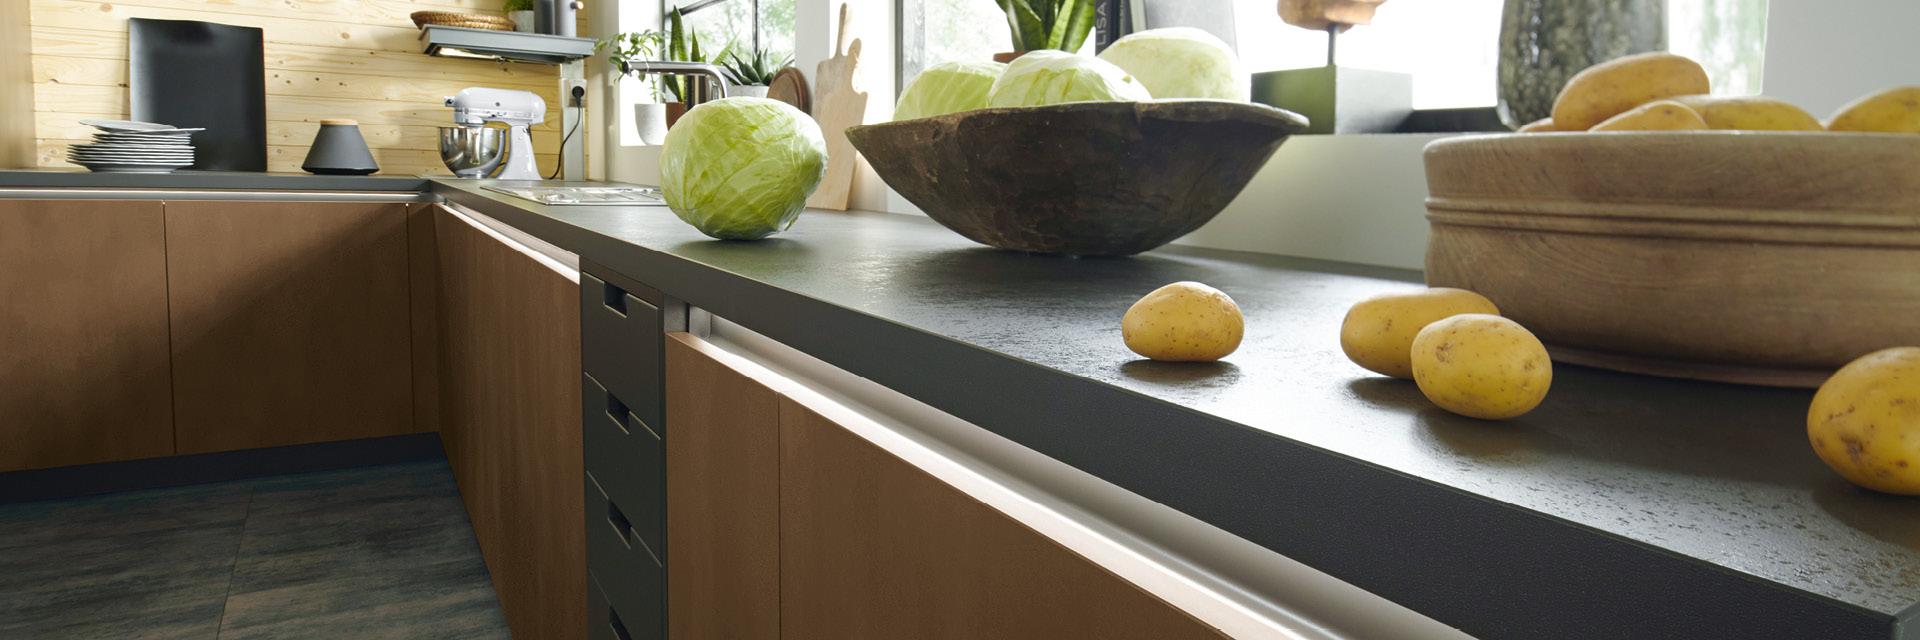 Sofa, hygge